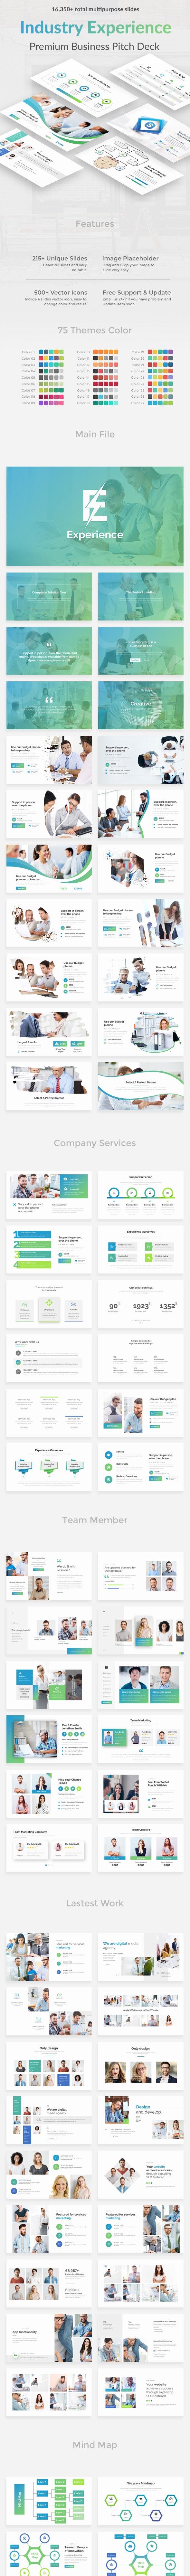 Industry Experience Pitch Deck Google Slide Template - Google Slides Presentation Templates